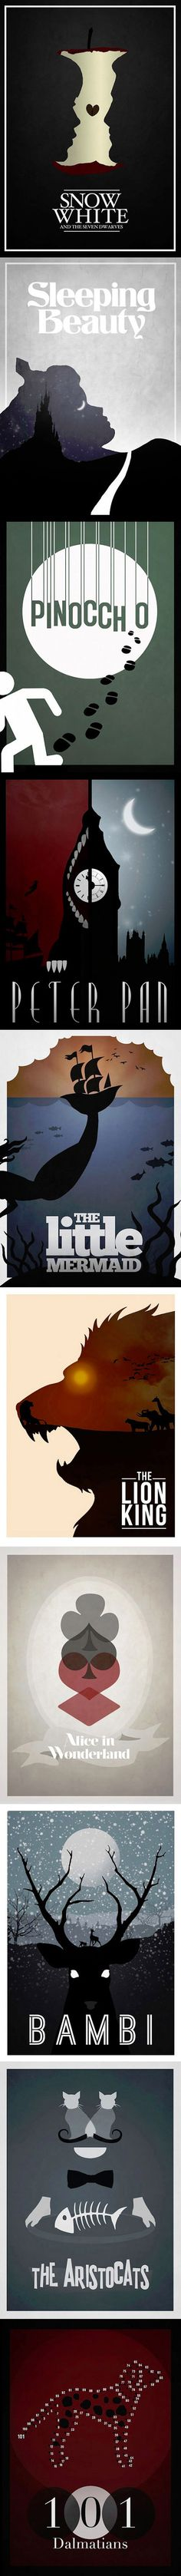 Disney Films (minimalist posters)   Snow White, Sleeping  Beauty, Pinnochio, Peter Pan, The Littler Mermaid, The Lion King, Alice in Wonderland, Bambi, The Aristocrats, & 101 Dalmatians